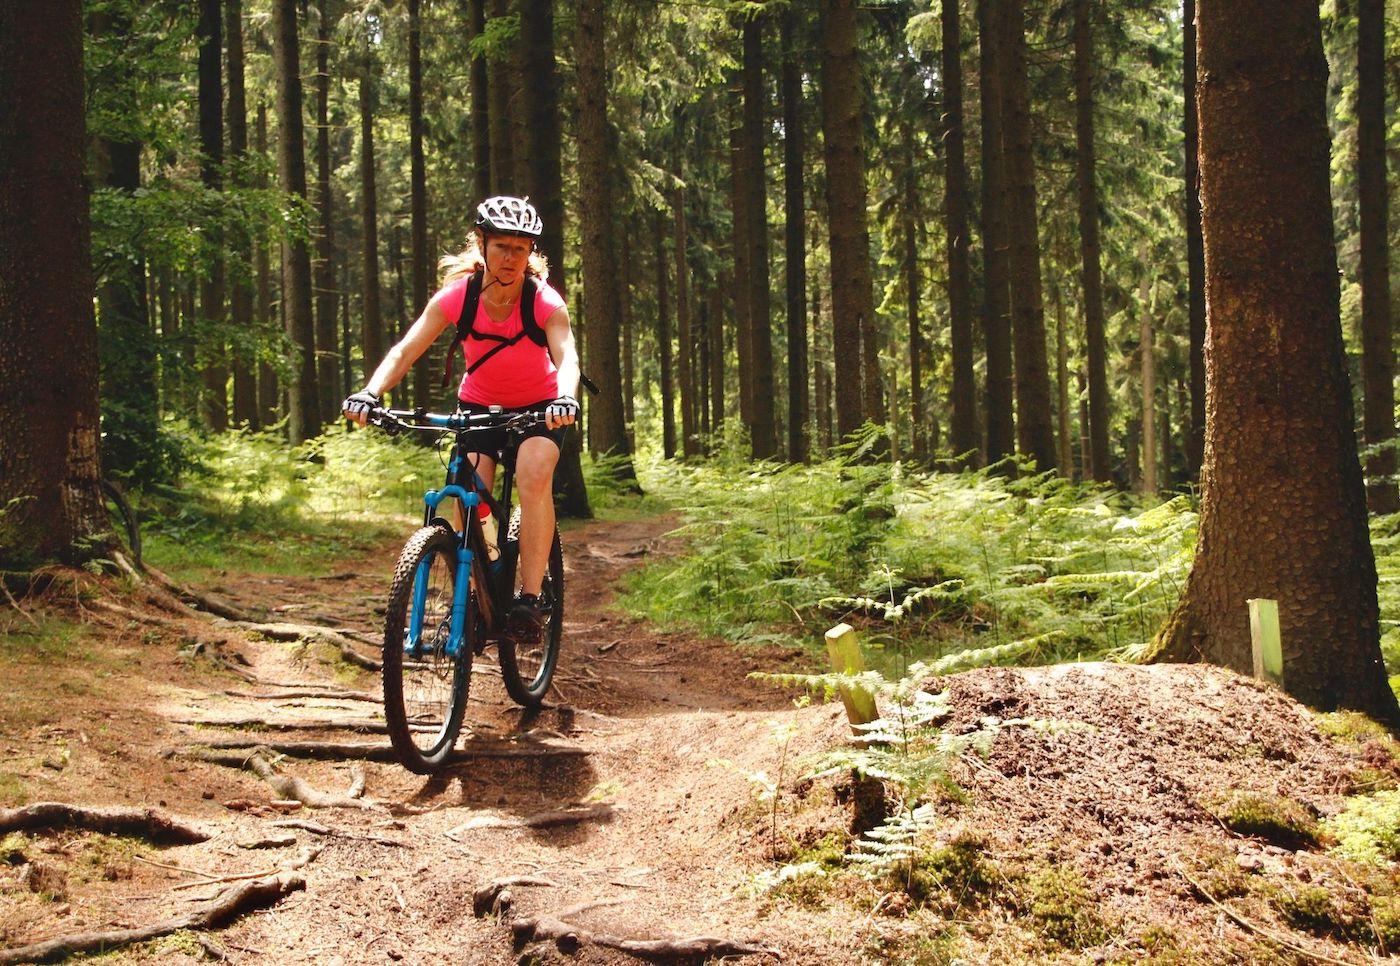 MTB eBike Kurse in Darmstadt - Frankenstein Fahrtechnik Training Rock my Trail Bikeschule